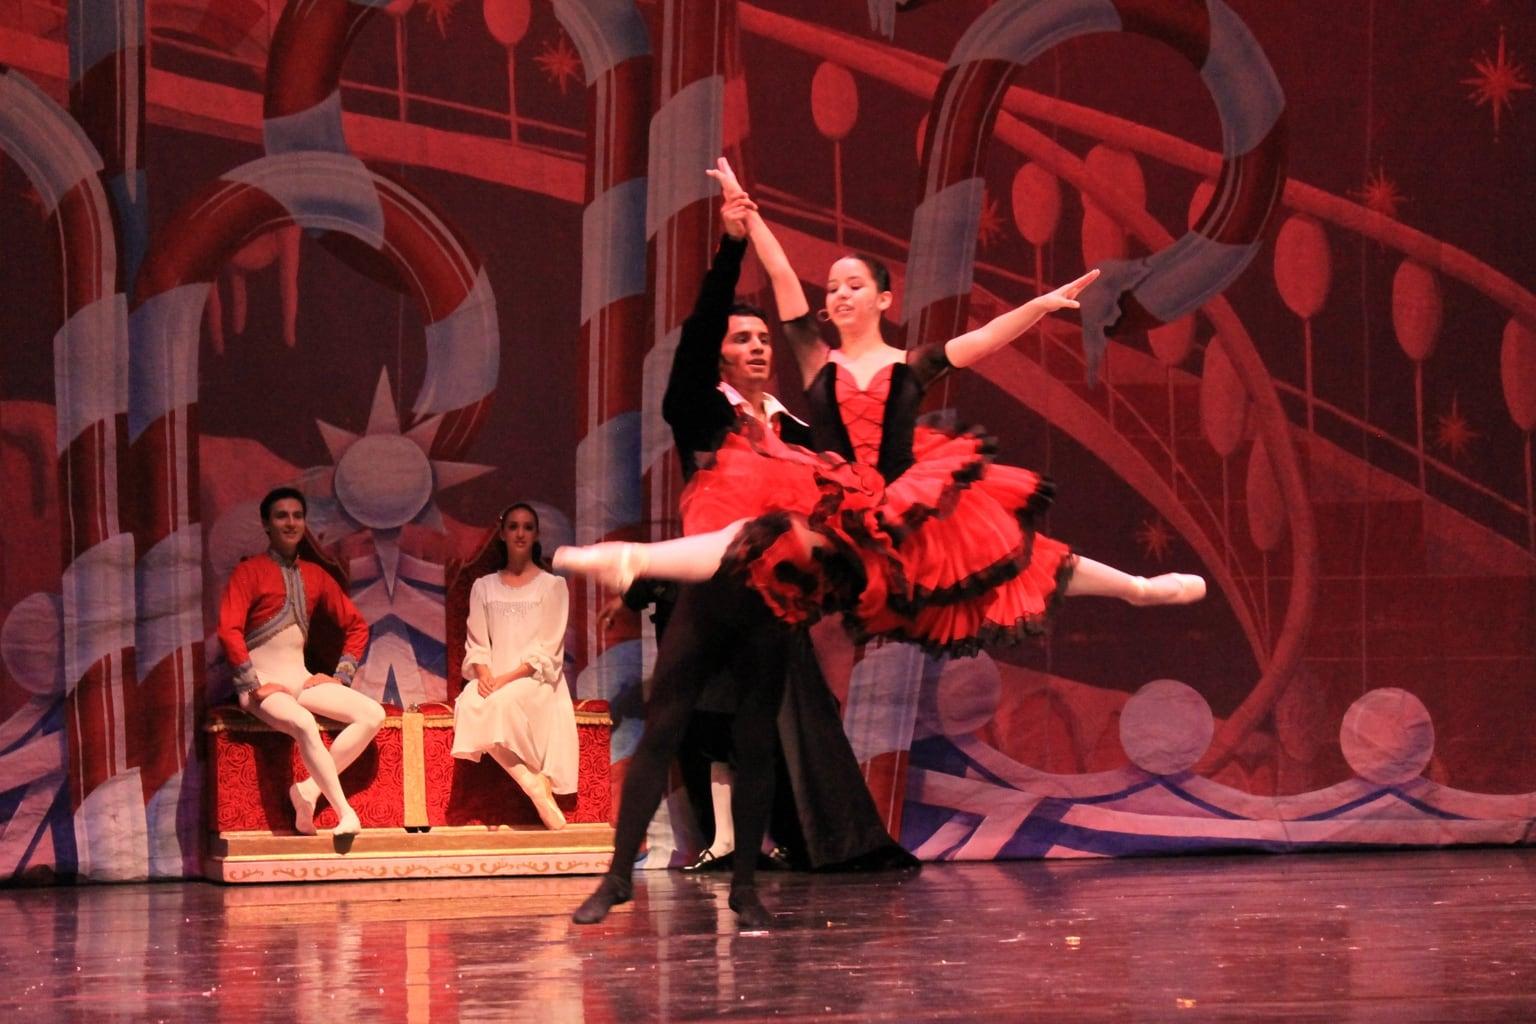 Spanish Dancers in The Nutcracker ballet